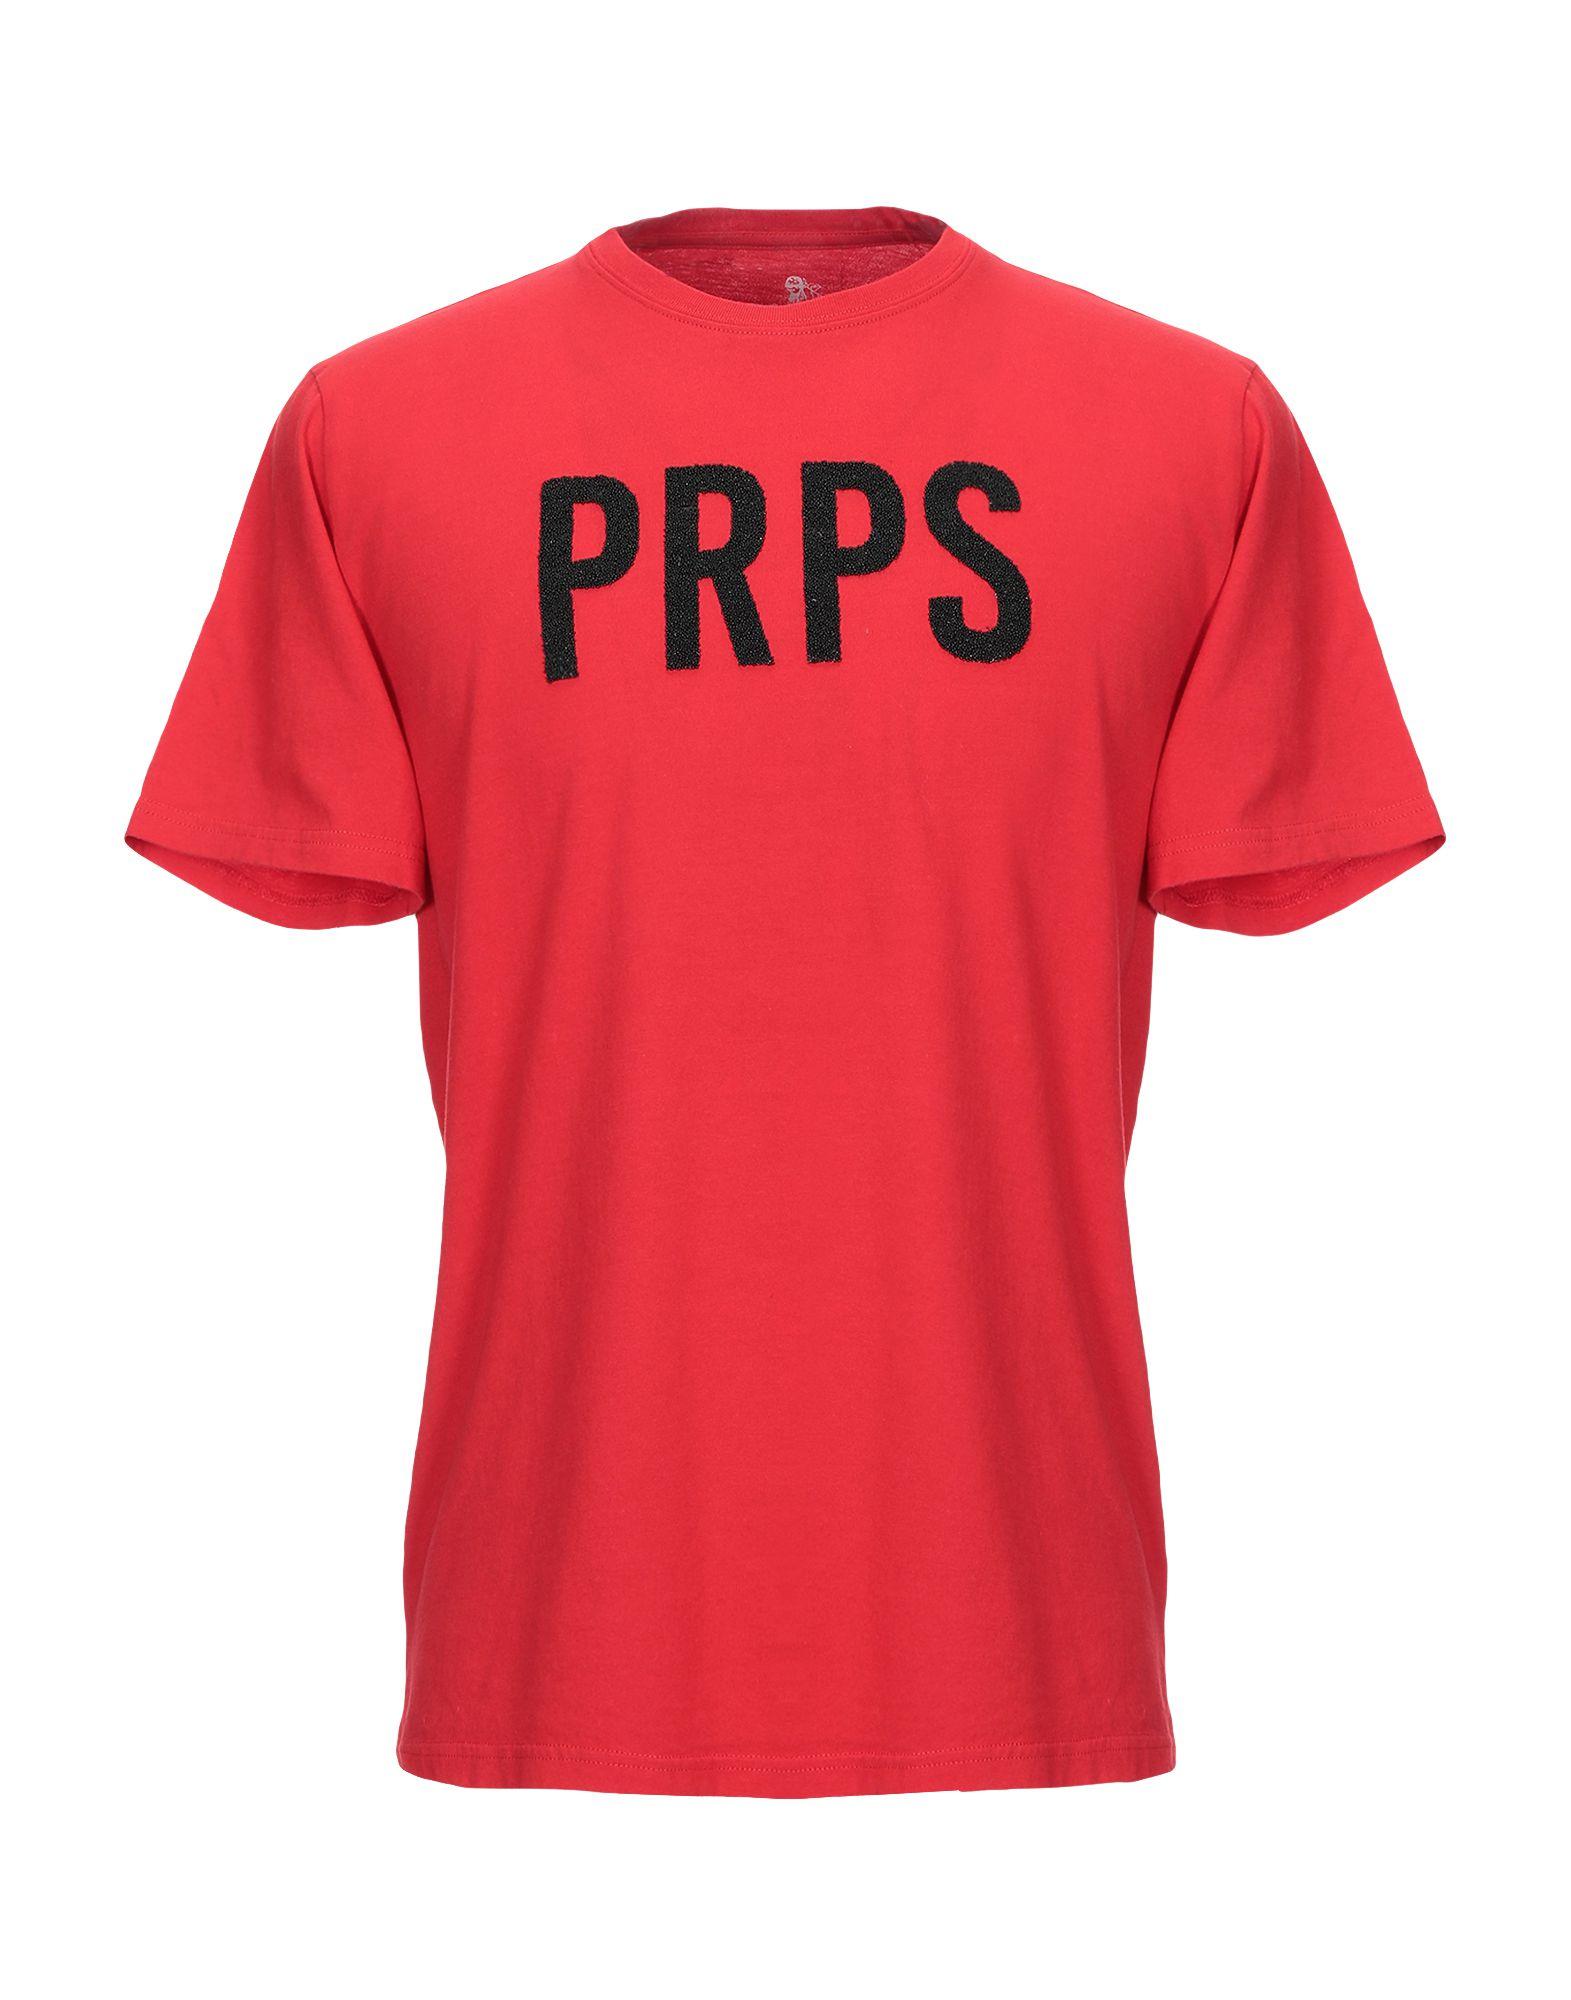 T-Shirt Prps uomo - - - 12307443SR d7c